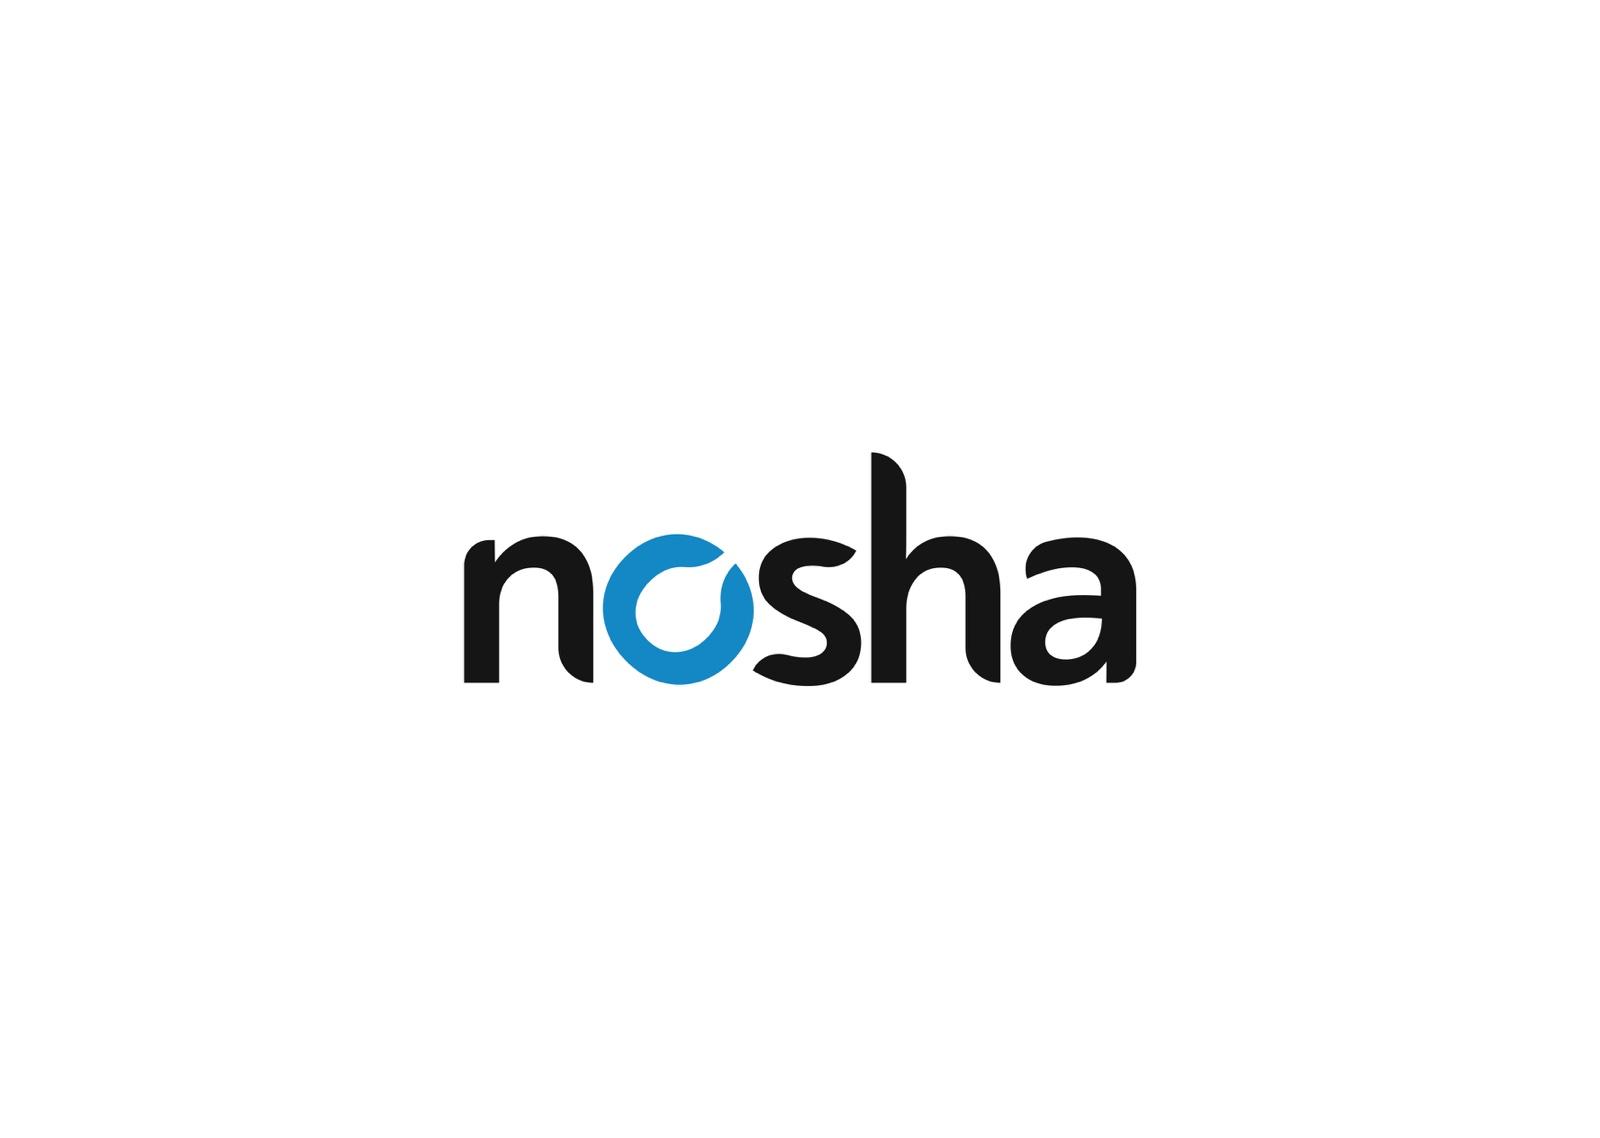 NOSHA